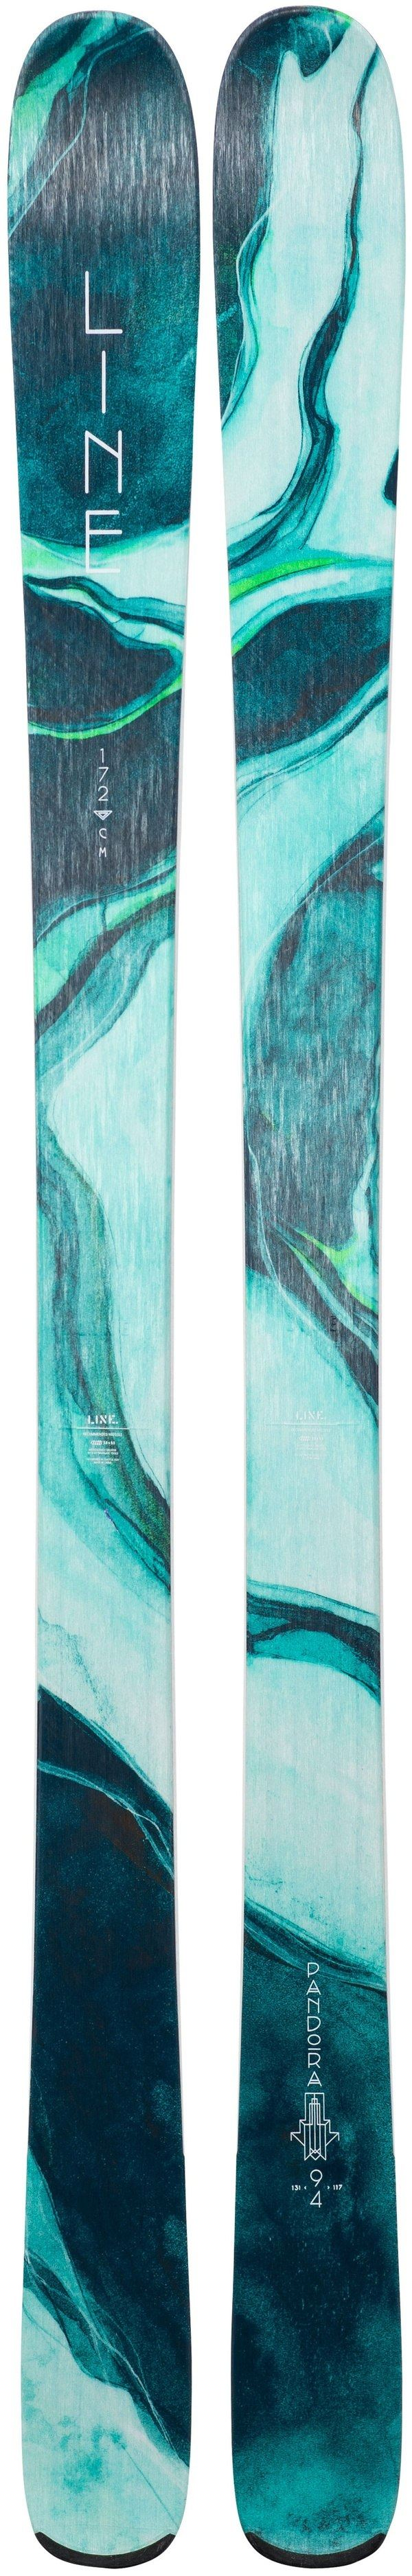 2019 Line Pandora 94 165cm Skis on Sale  94d0c1cf01c8